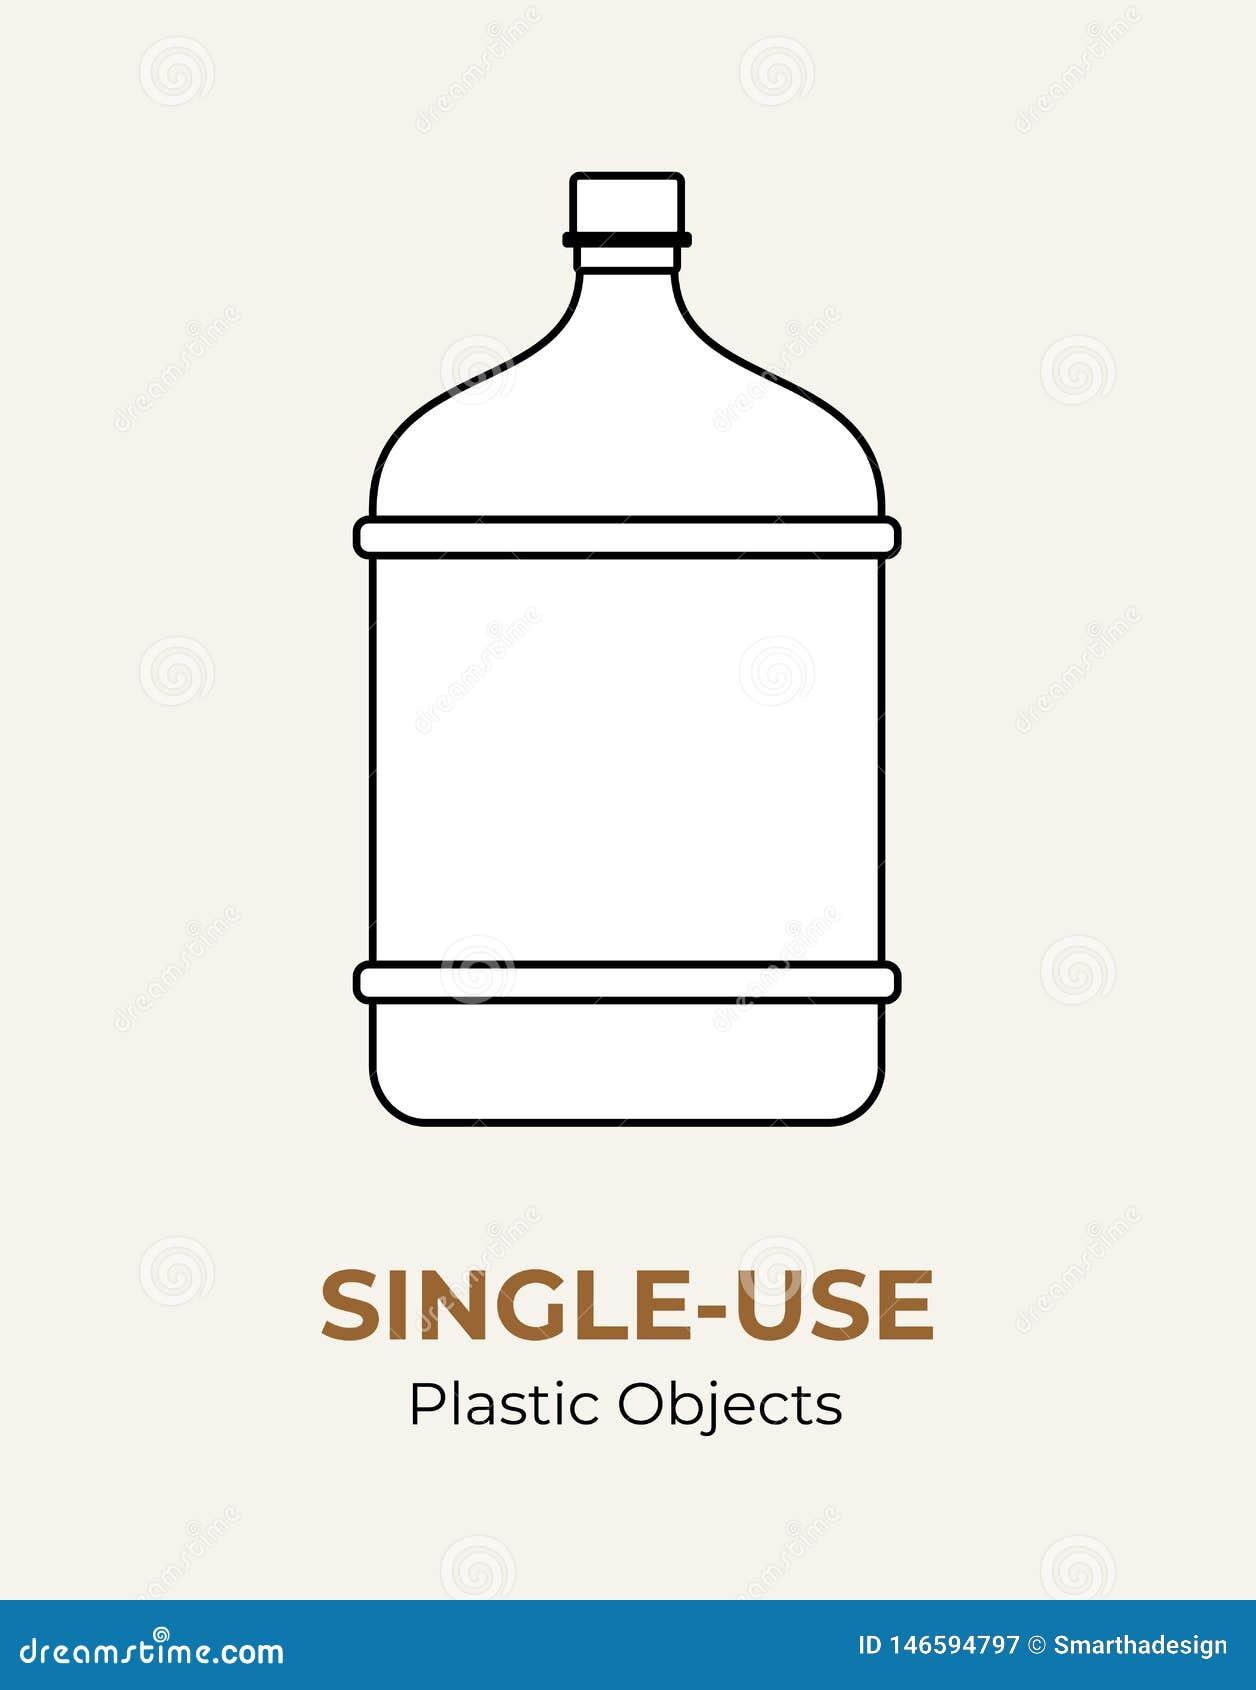 Plastic grote fles voor ??nmalig gebruik Vectorillustratie van het recycling van plastic fles Ge?soleerde transparante grote fles